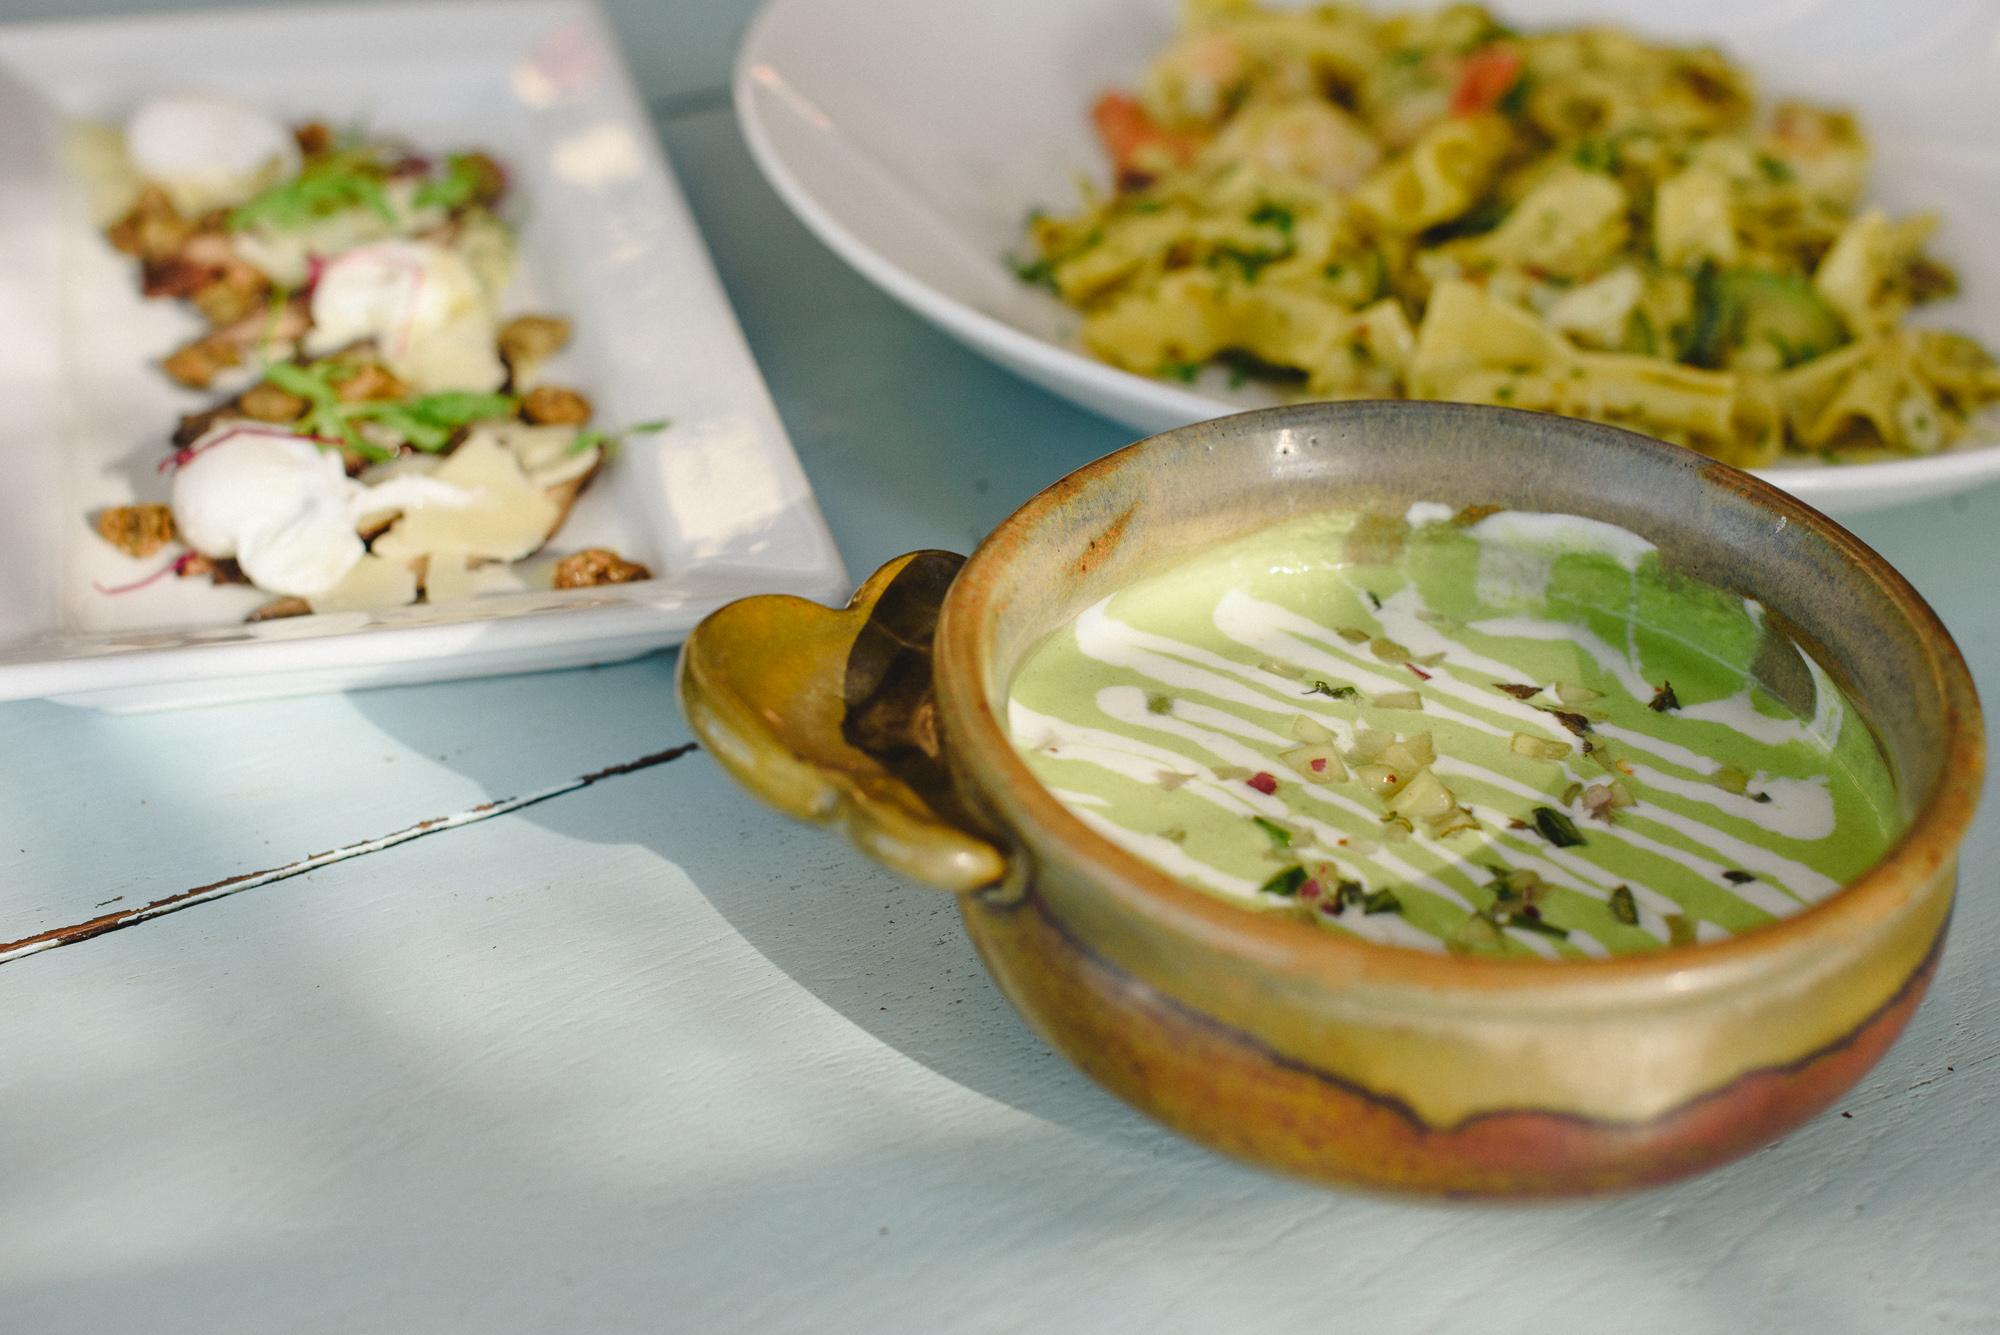 A-Tavola-Trattoria-New-Paltz-Hudson-Valley-NY-Best-Italian-Restaurant-173.jpg